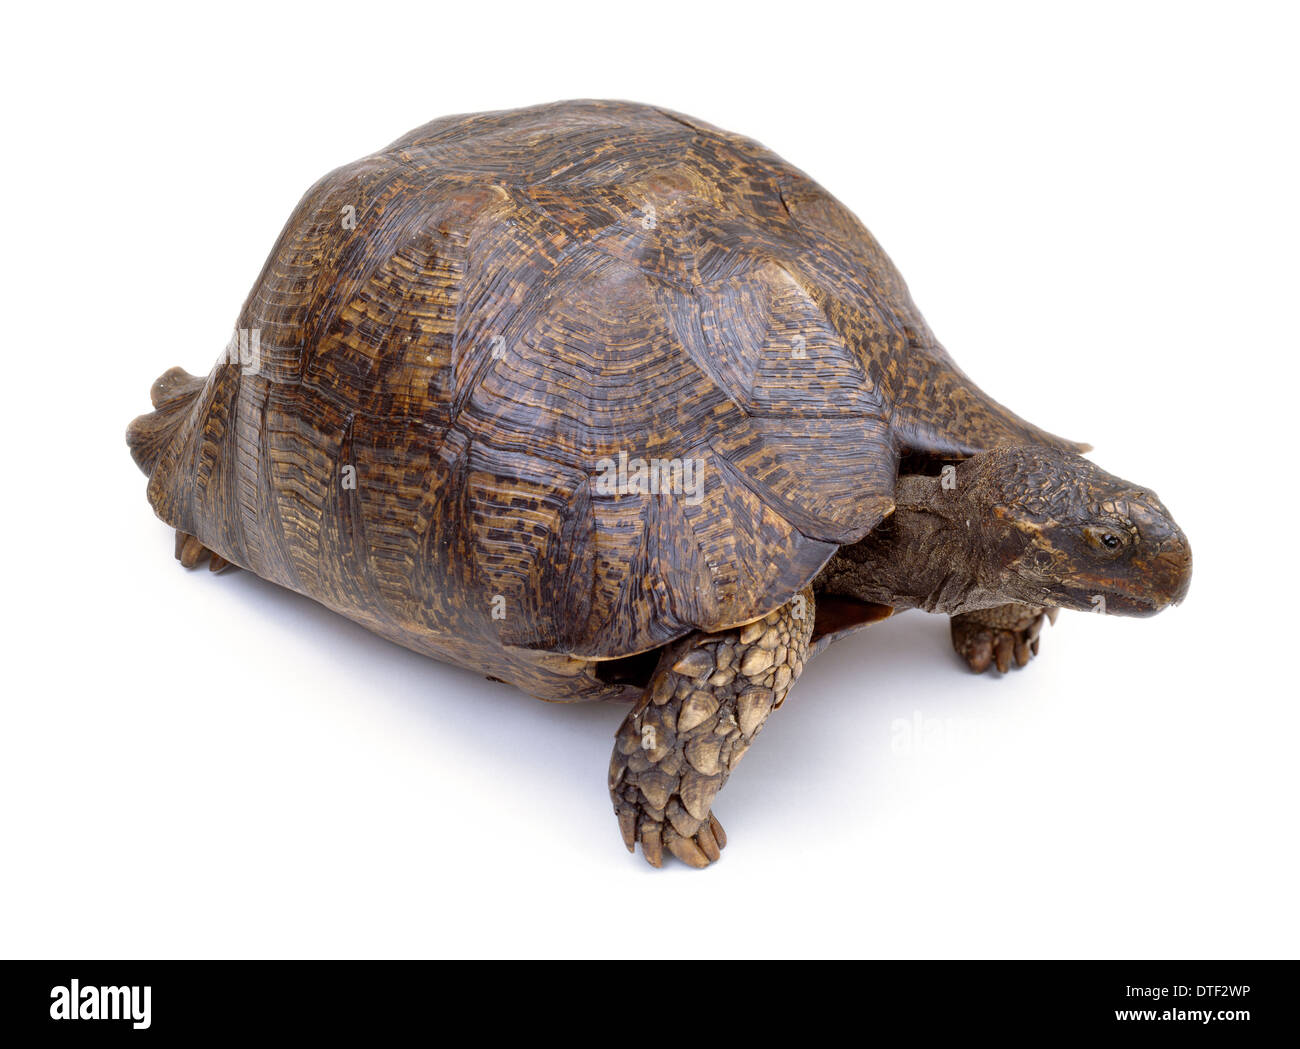 Mounted tortoise specimen - Stock Image